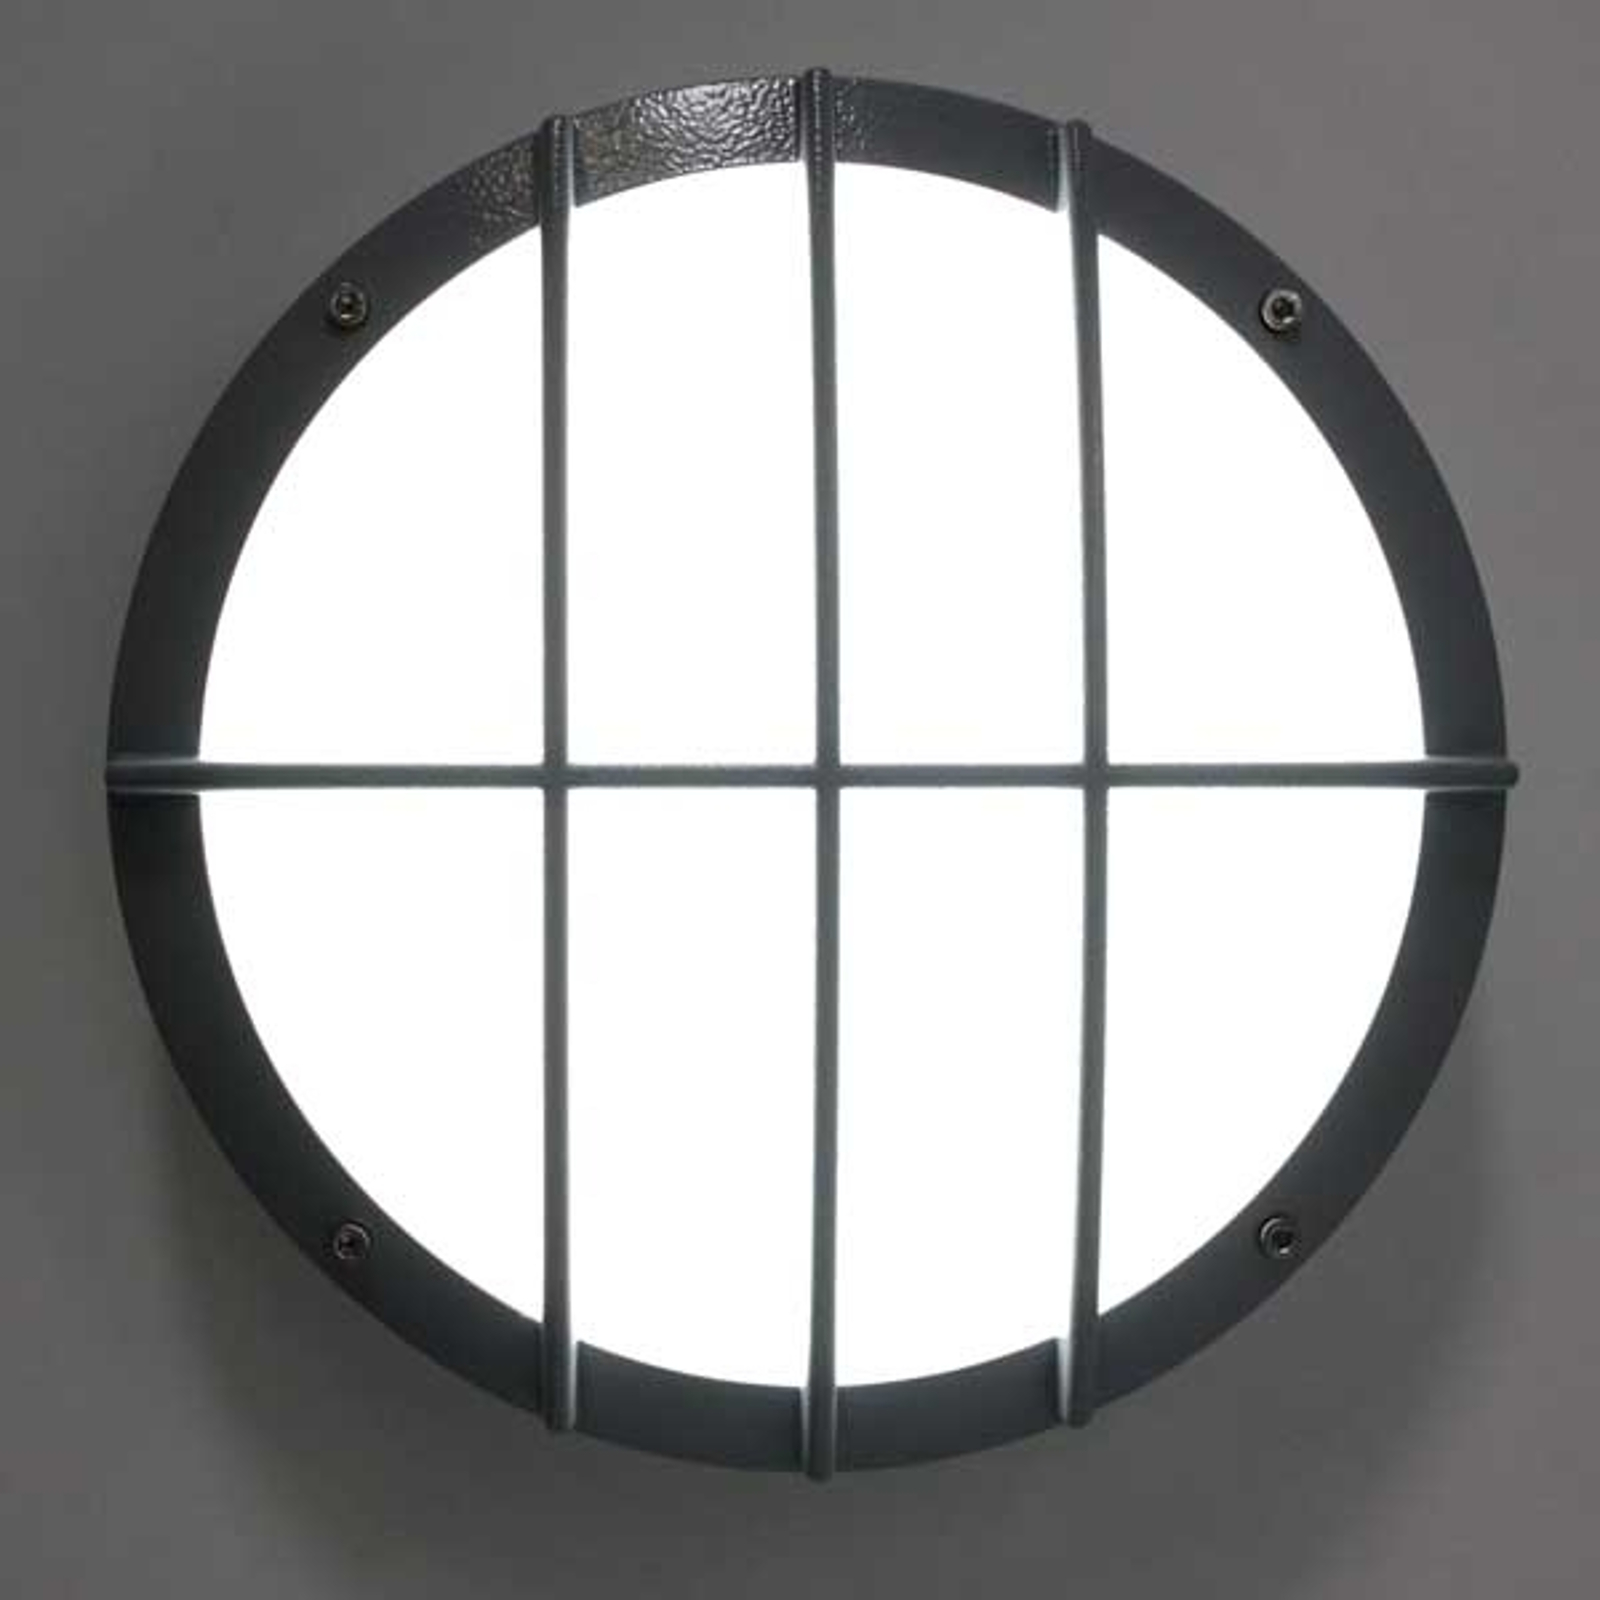 Aluminiumgjutgods vägglampa SUN 8 LED, 8W 3K